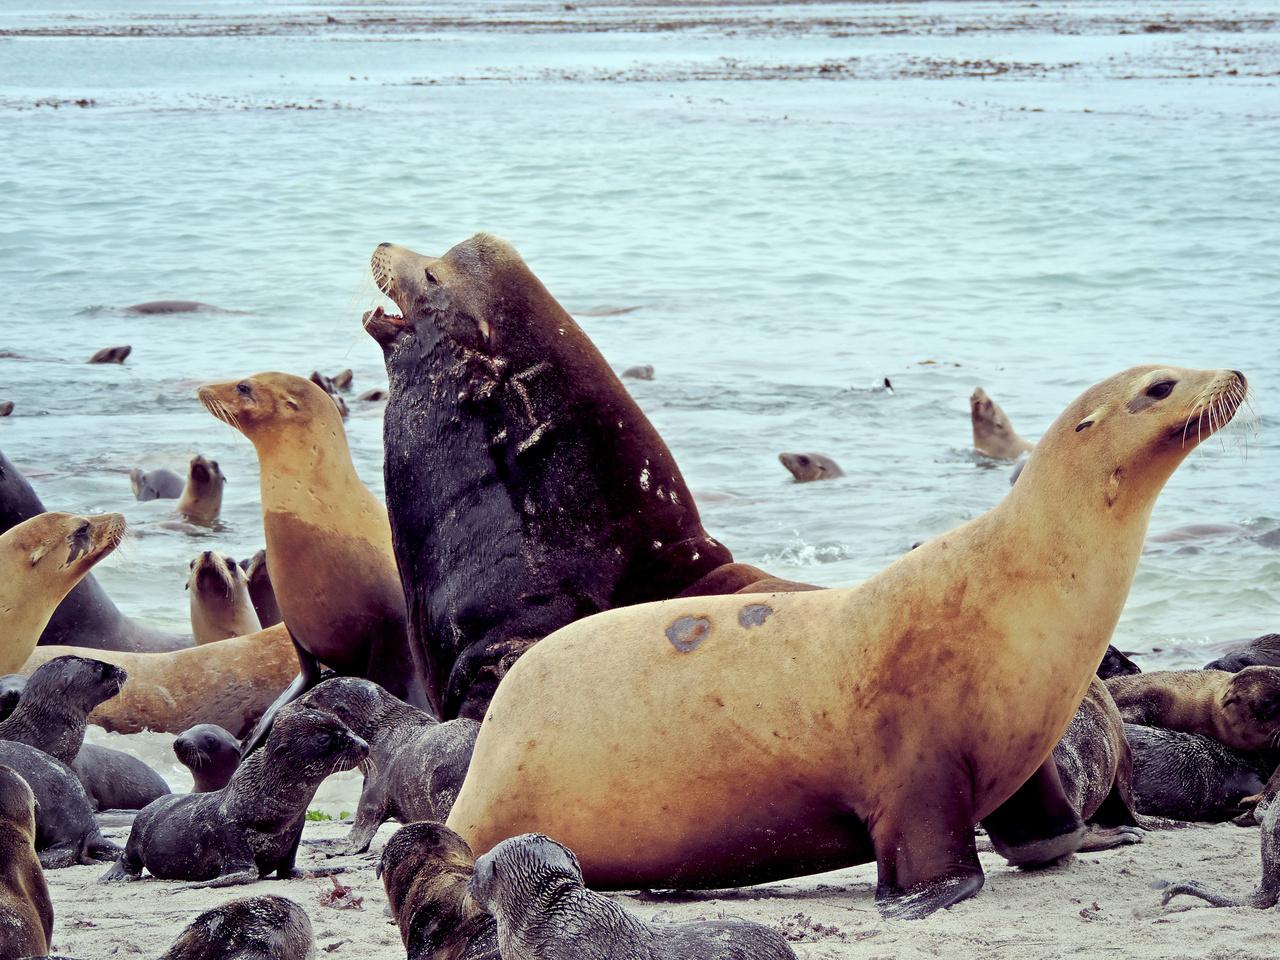 California Sea Lion Rookery, Photo credit: Sharon Melin